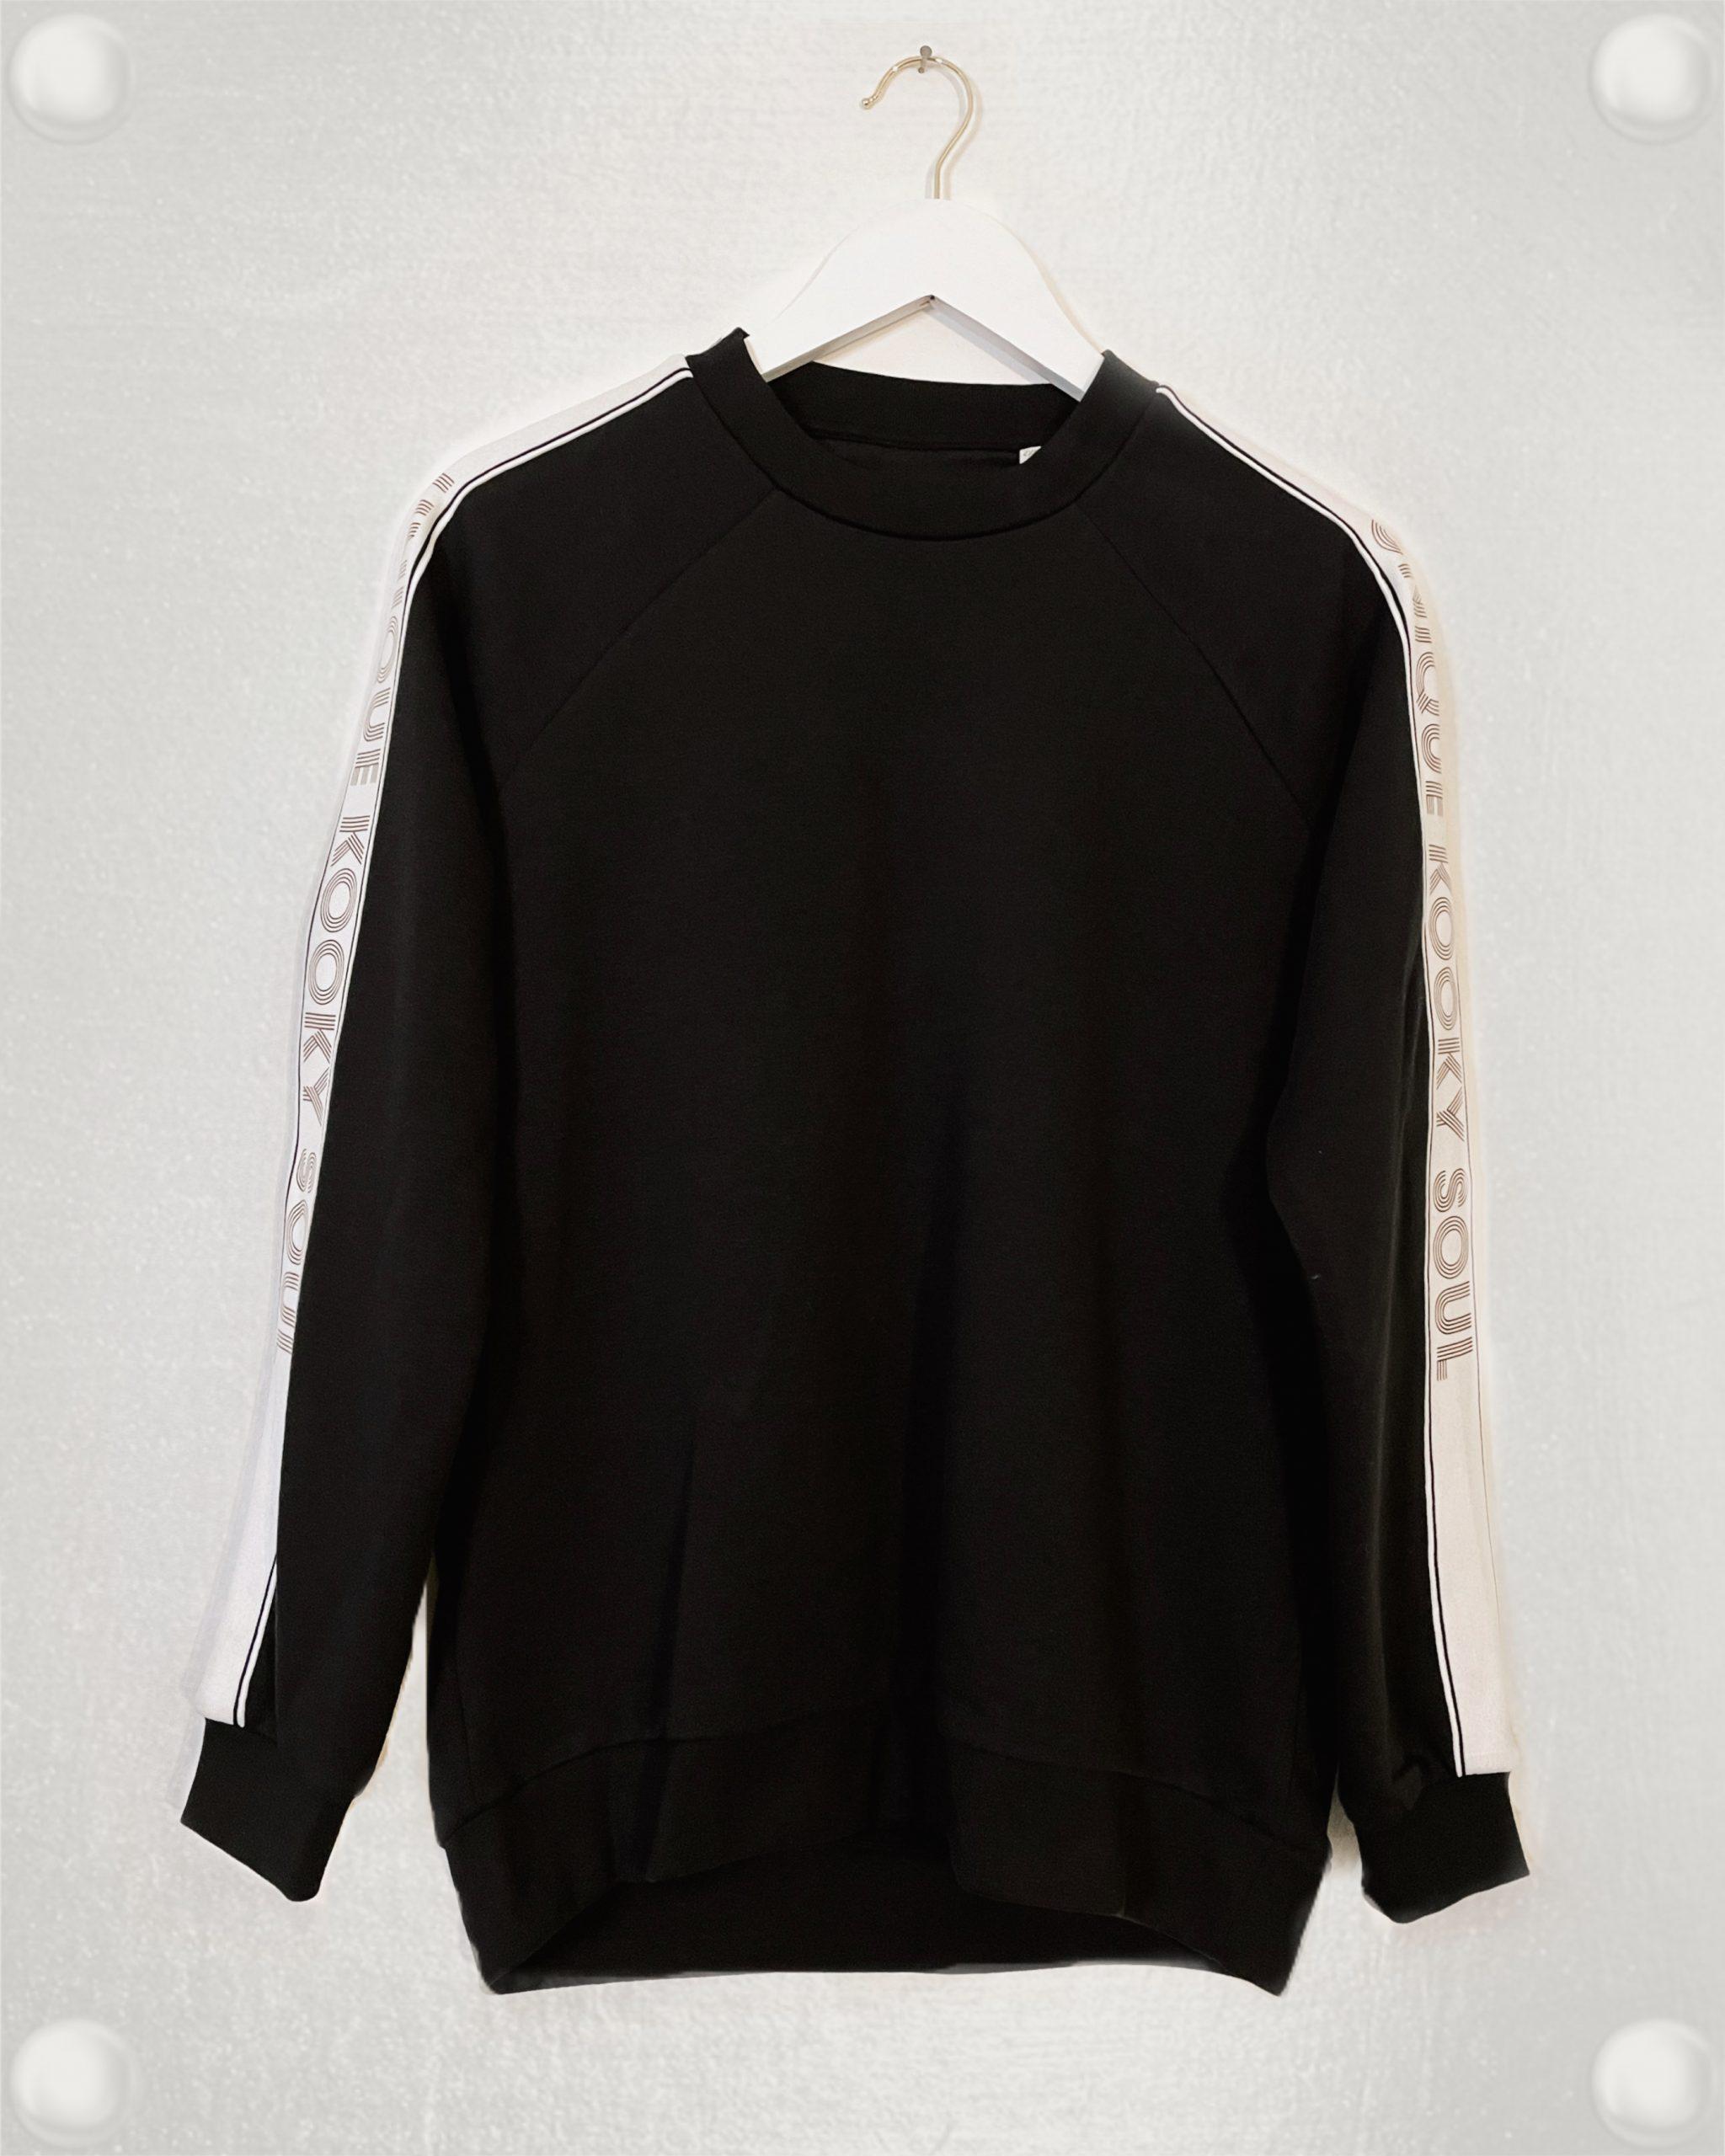 Black & Copper Printed Contrast Sweatshirt